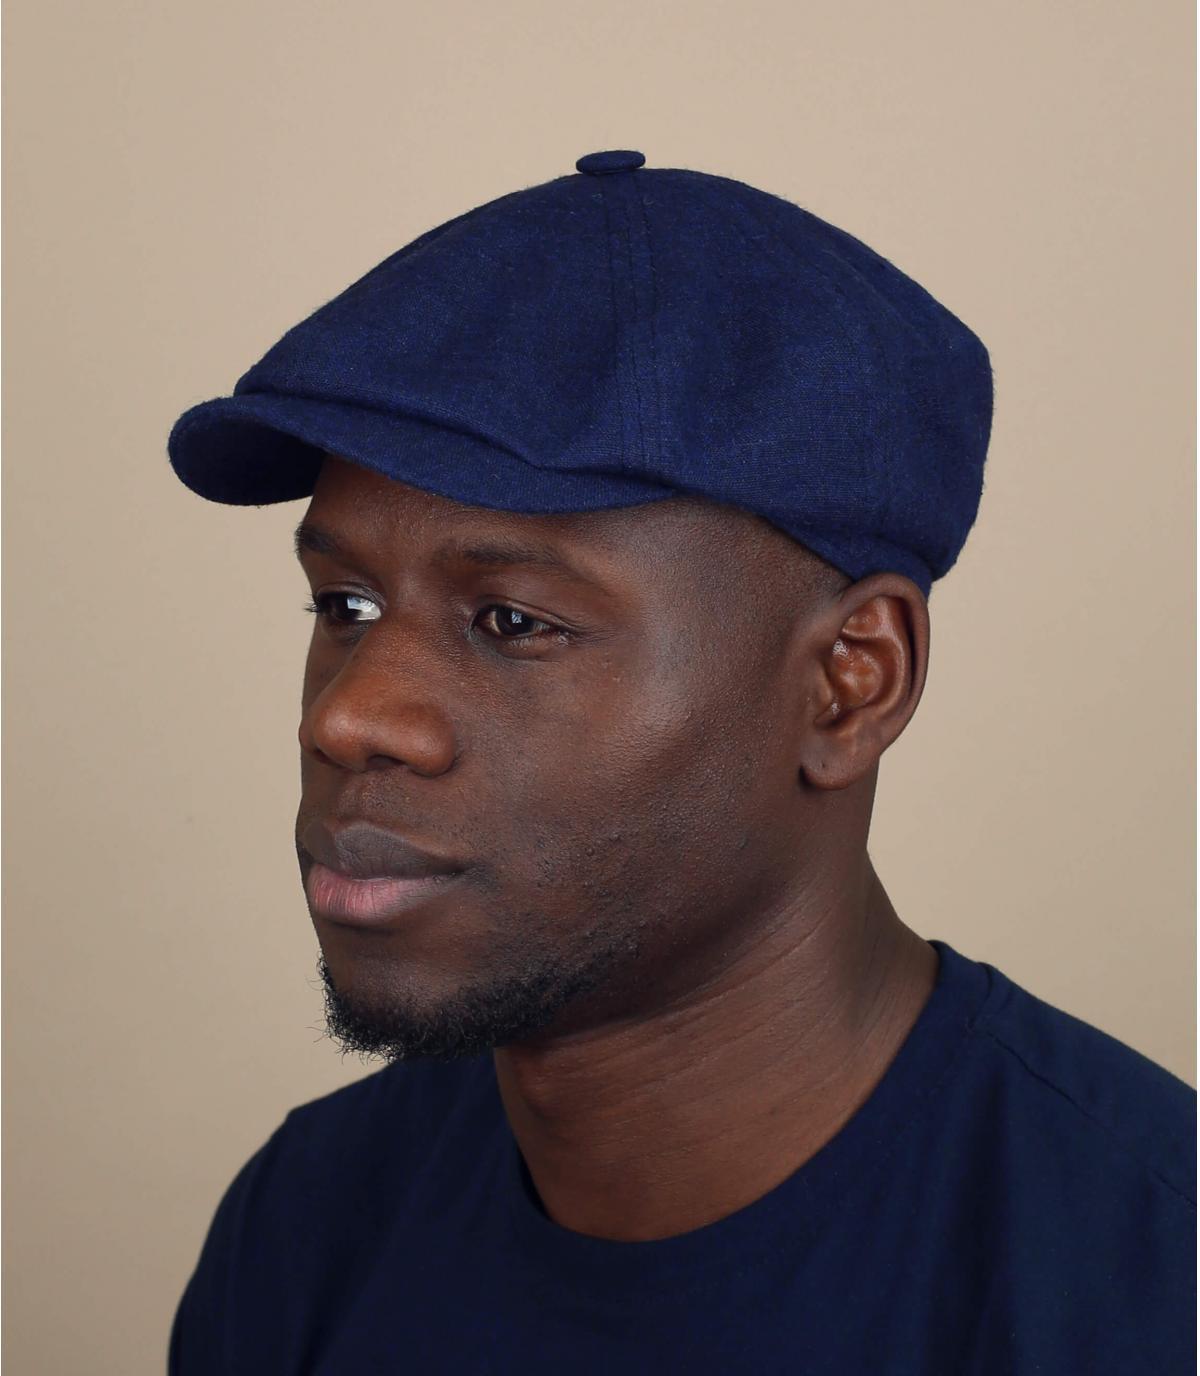 Krantenjongens baret in blauw linnen